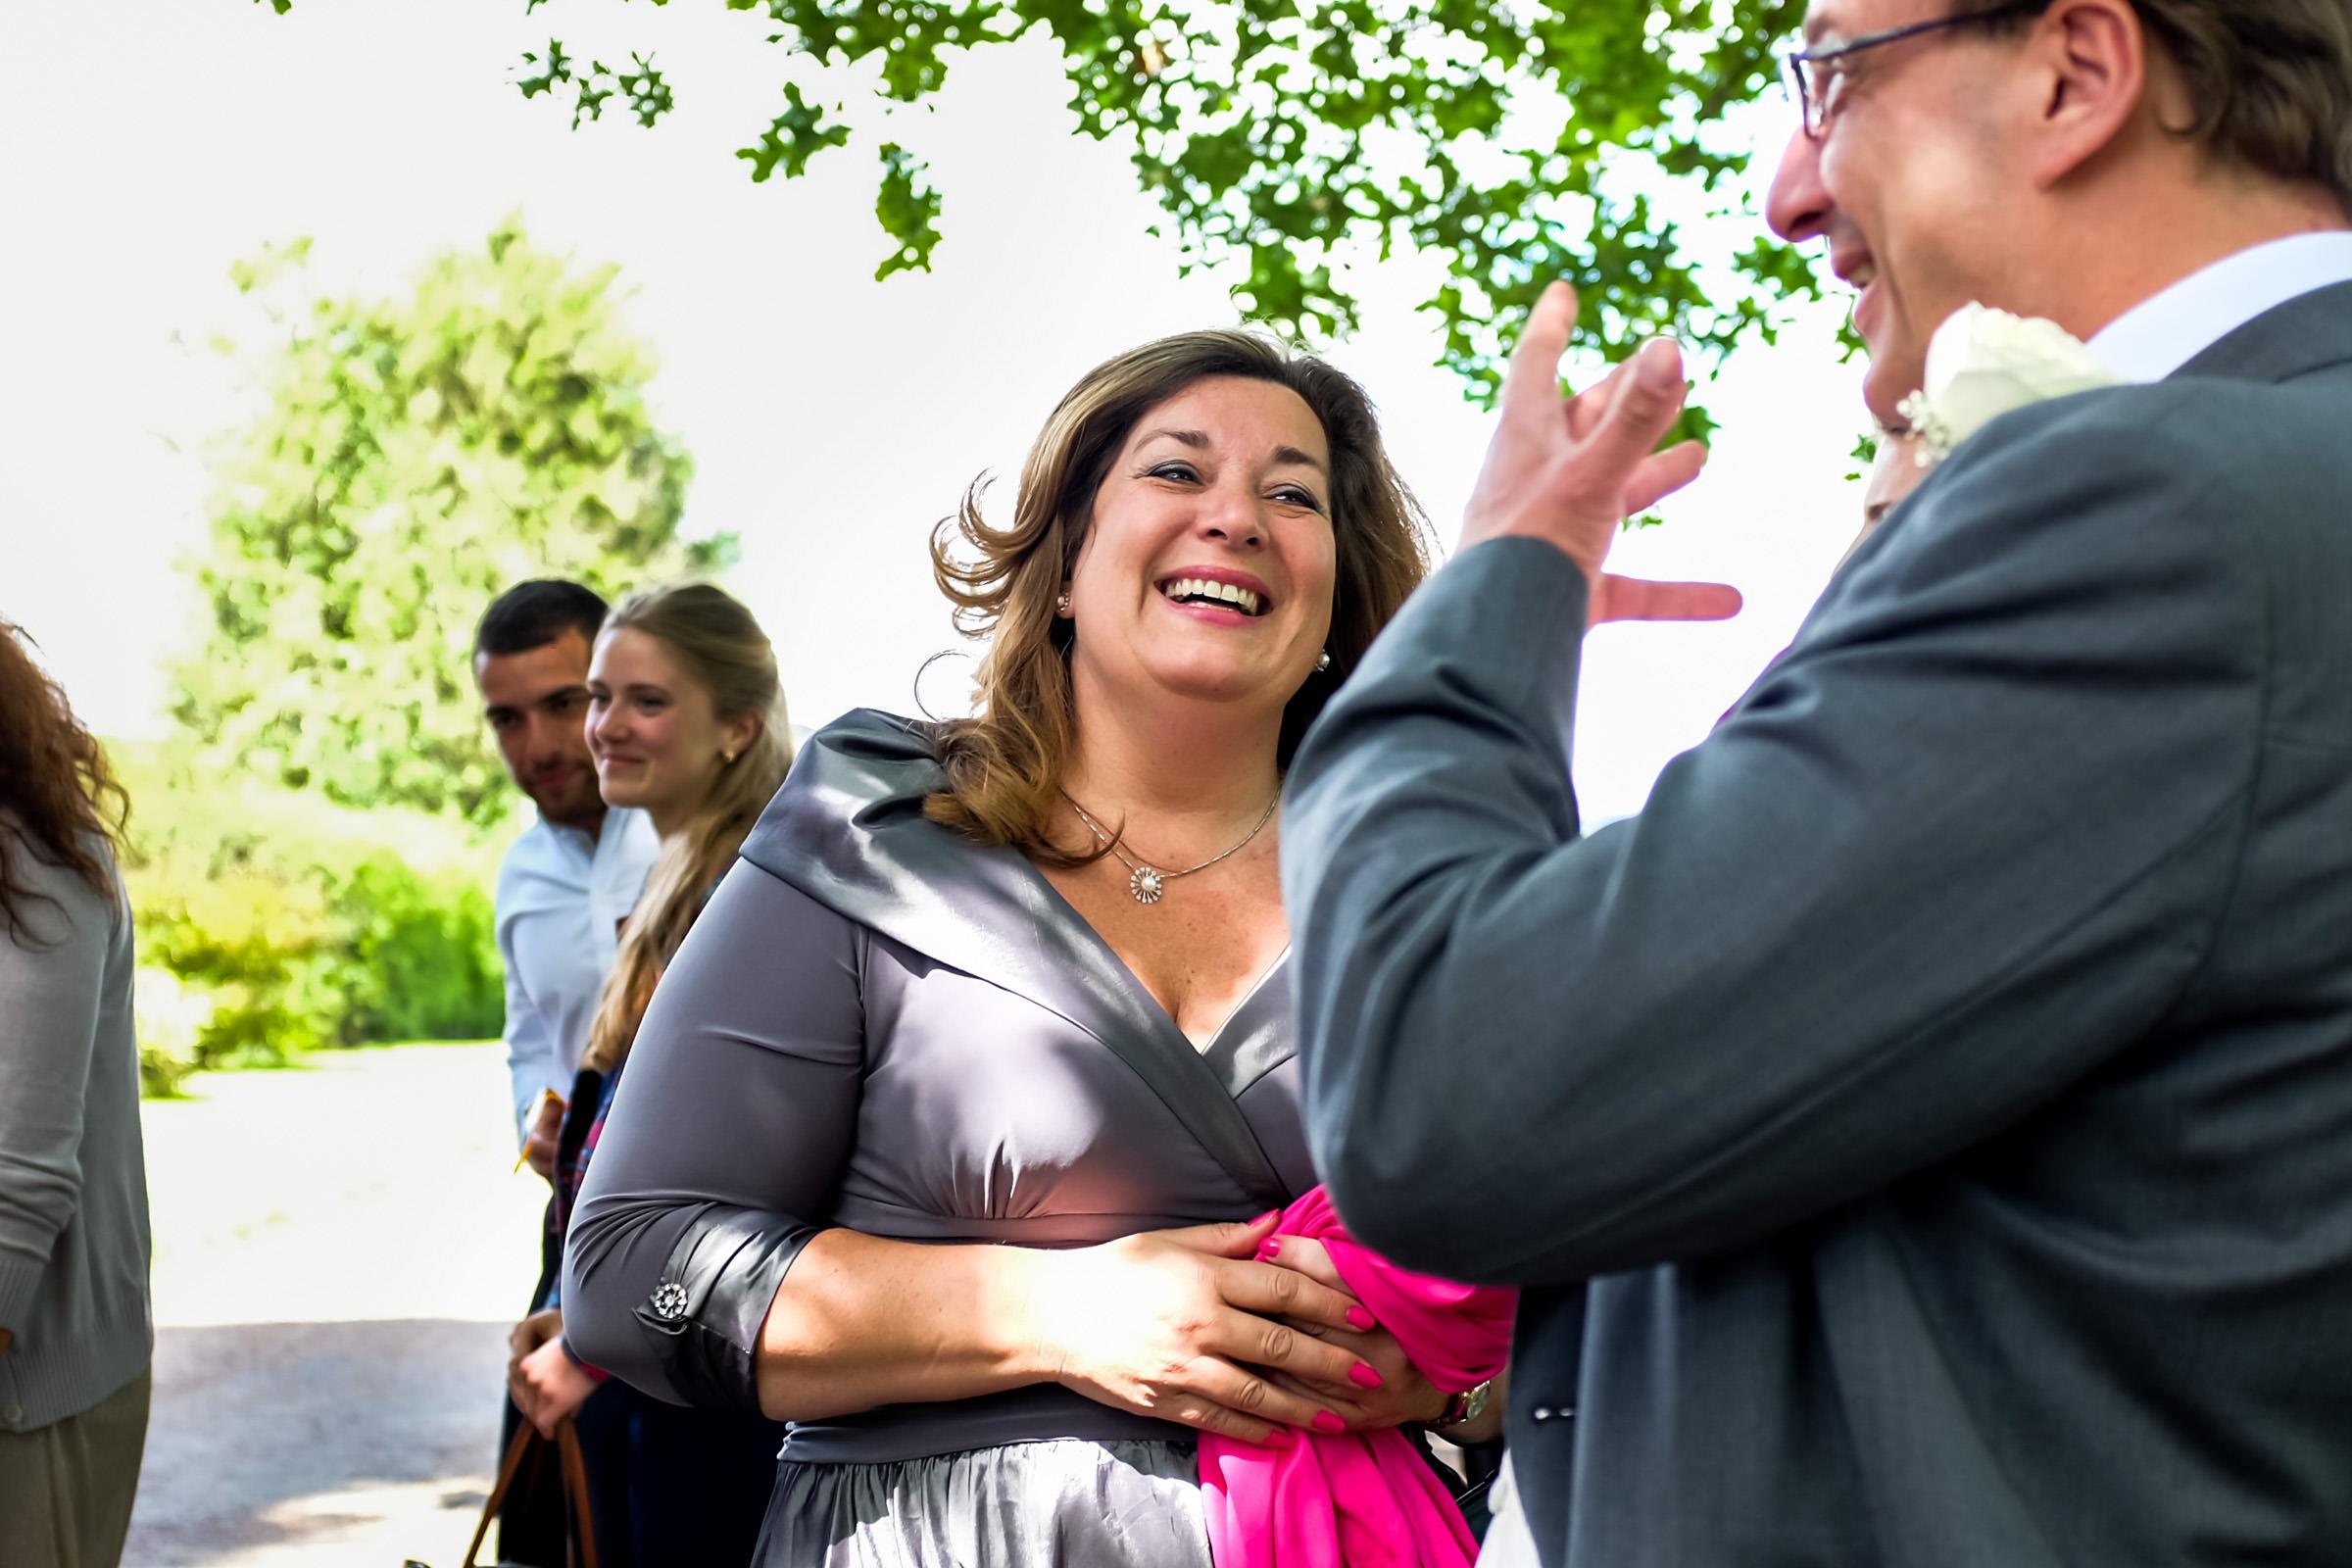 Wedding at Clandon Park in Guildford 003.jpg